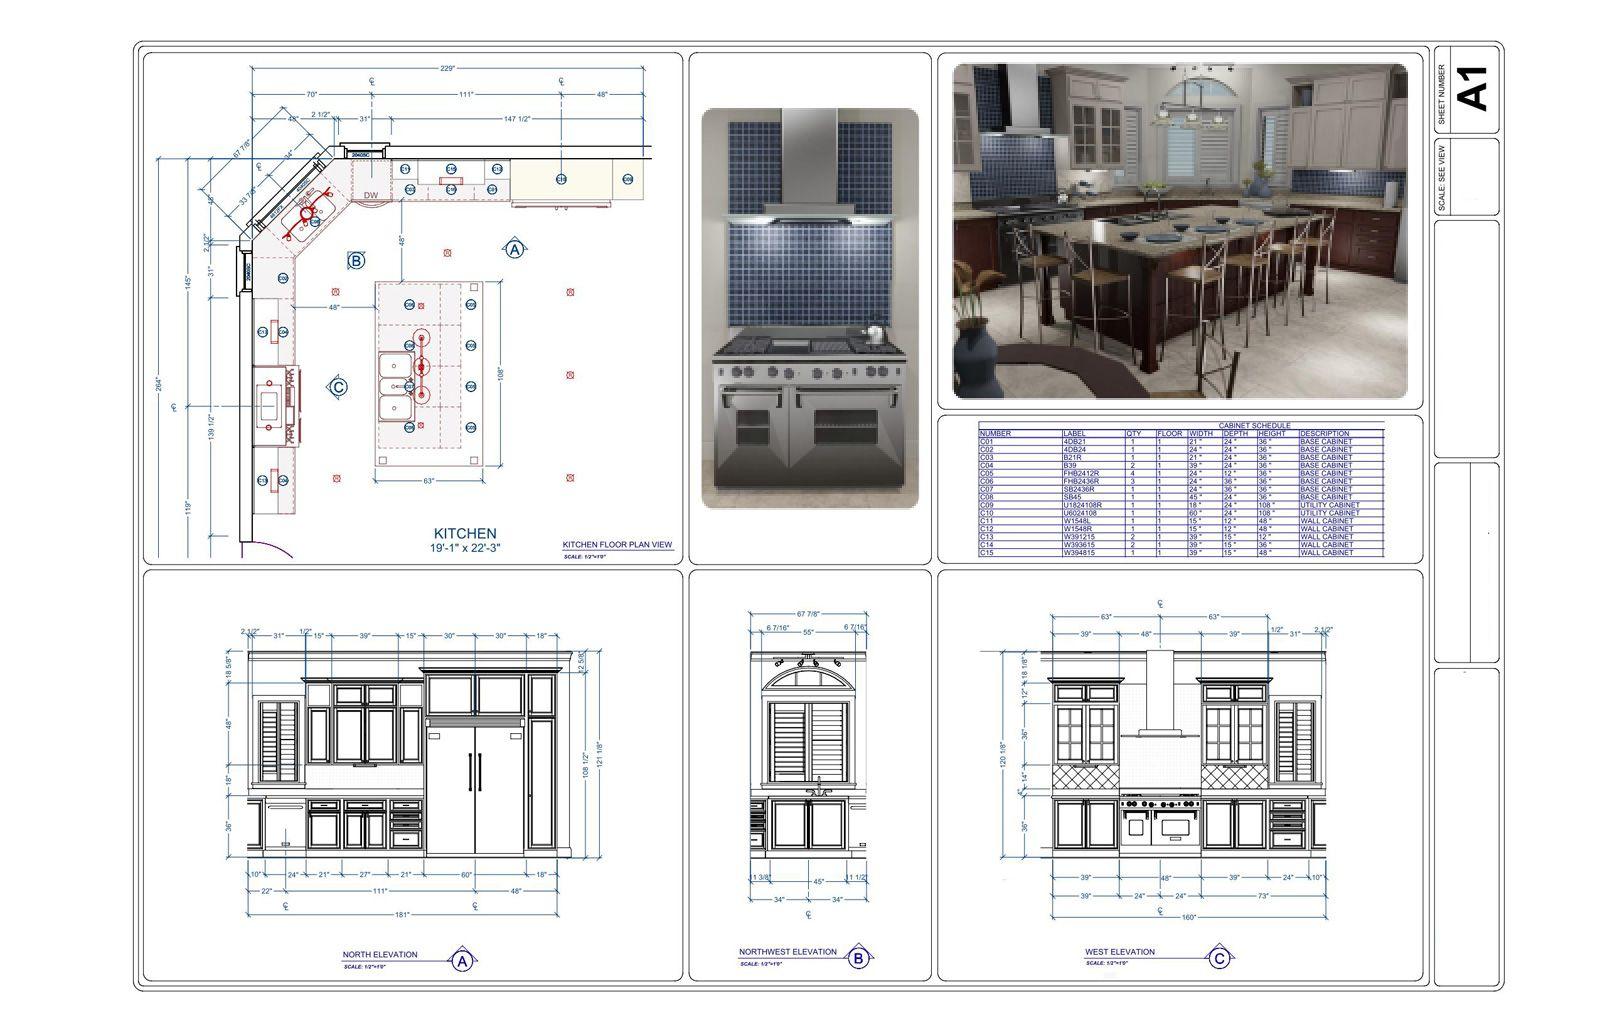 hotel restaurant kitchen design commercial layout amp